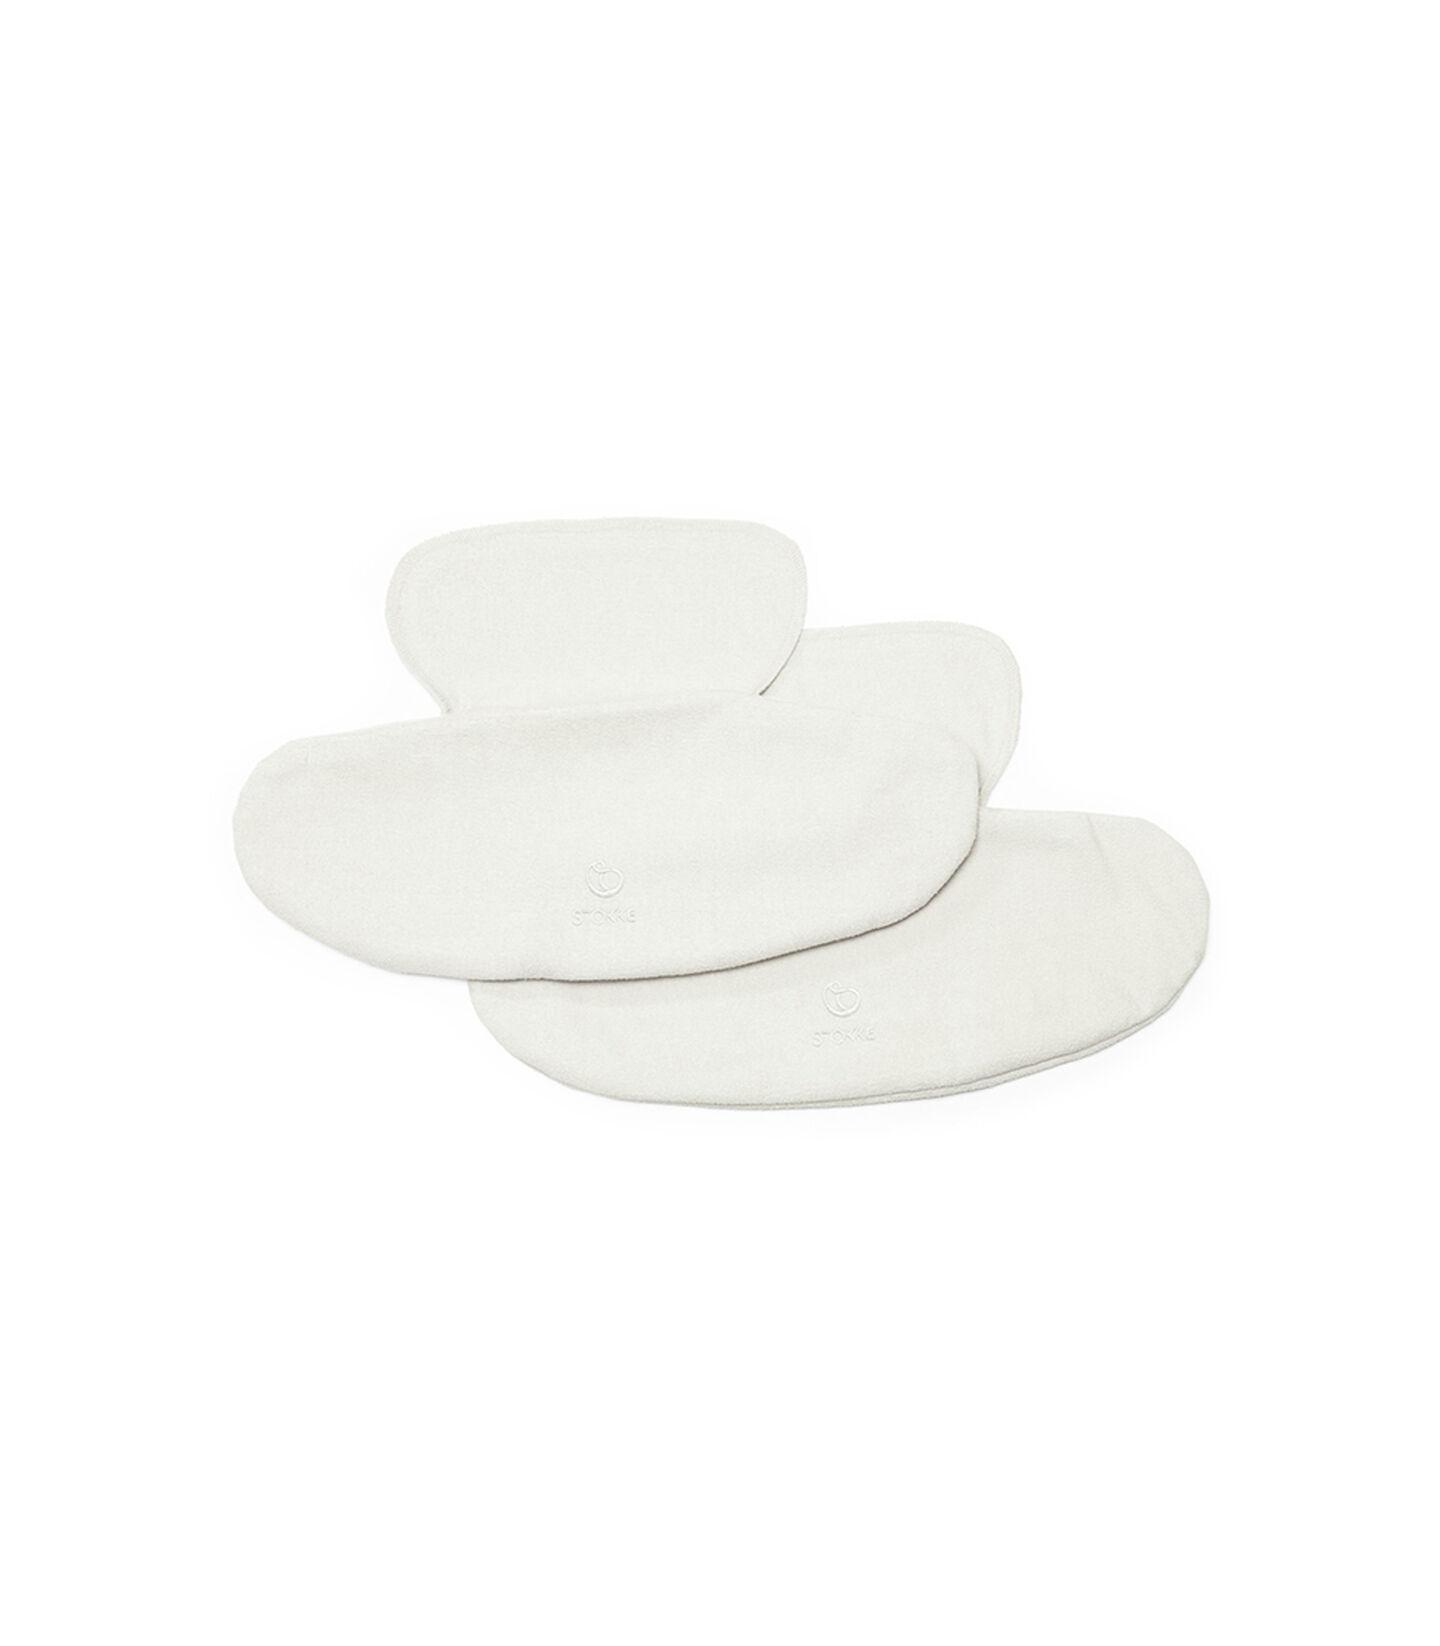 Babero blanco para Stokke® MyCarrier™, Blanco, mainview view 1